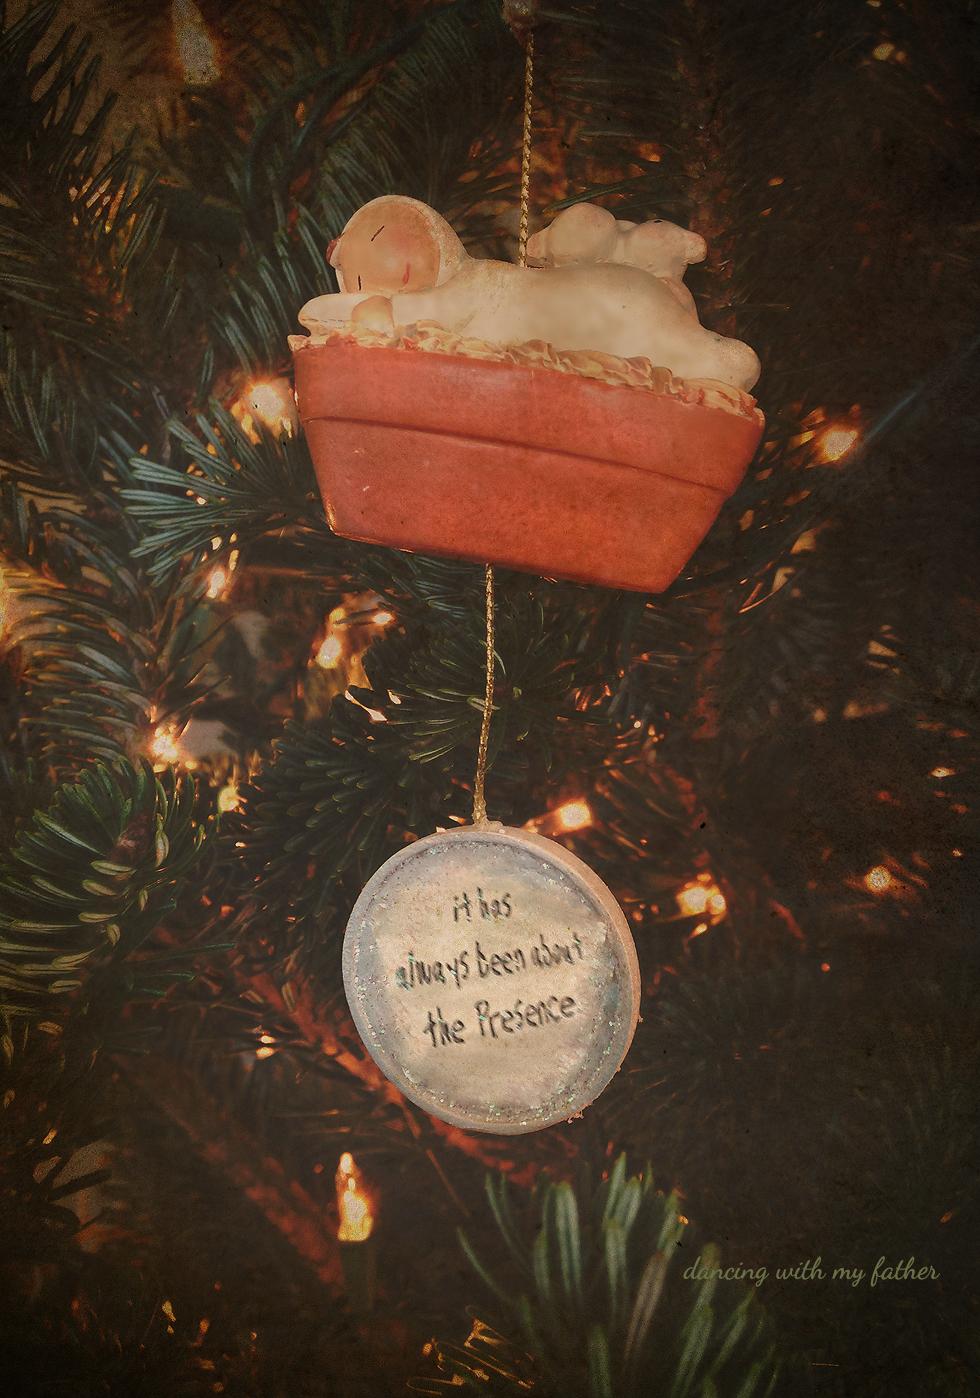 nativity_scene_web_b